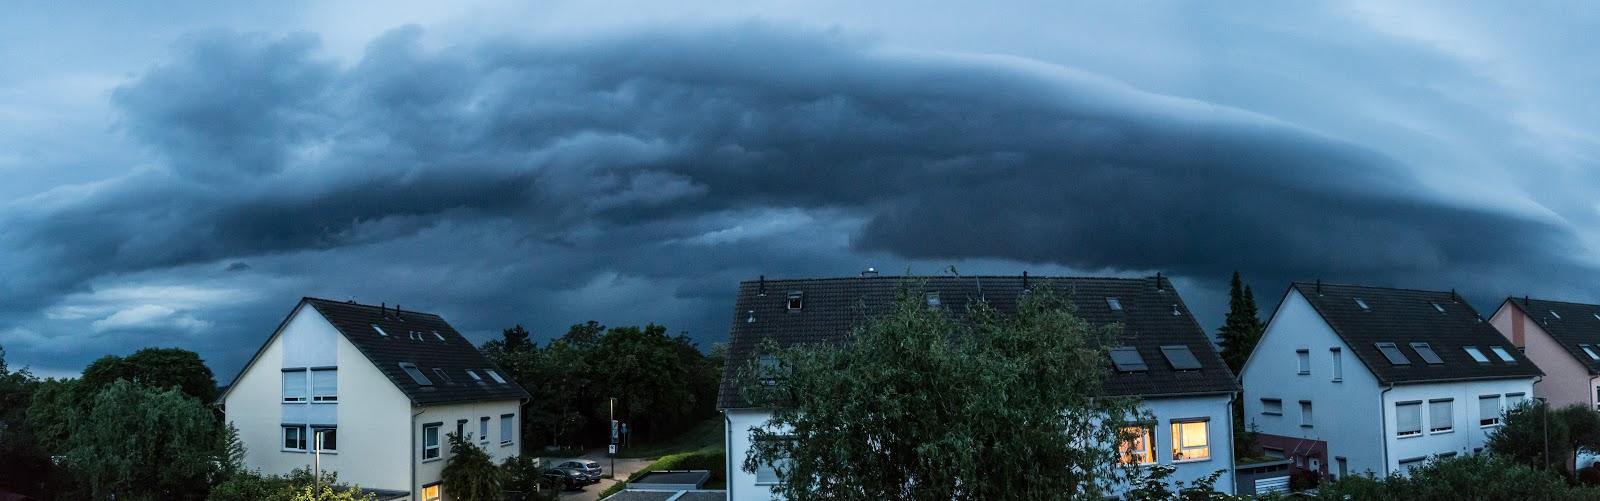 Shelf cloud over Griesheim